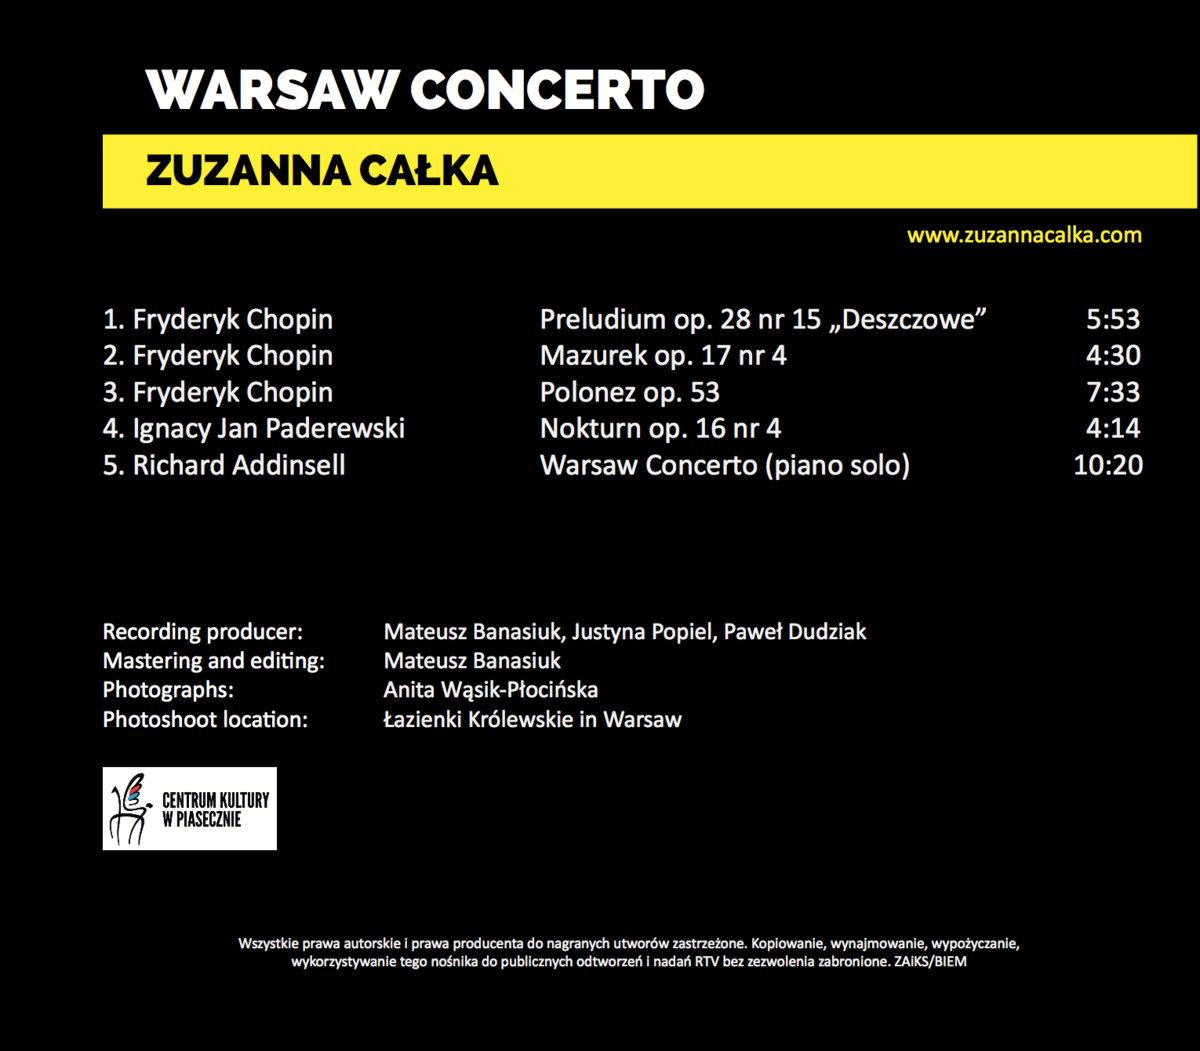 Warsaw Concerto   Zuzanna Całka